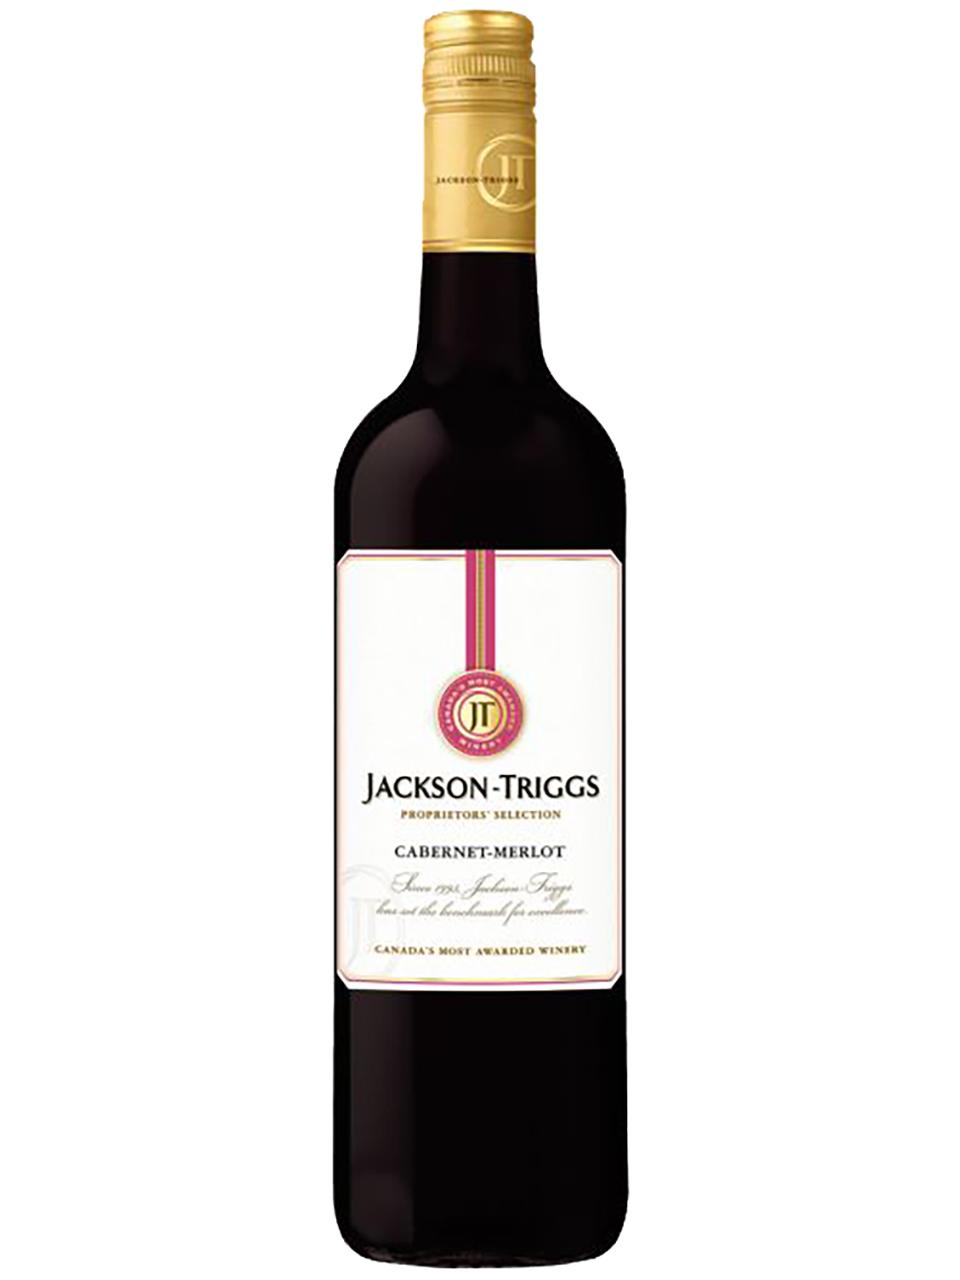 Jackson Triggs PS Cabernet-Merlot